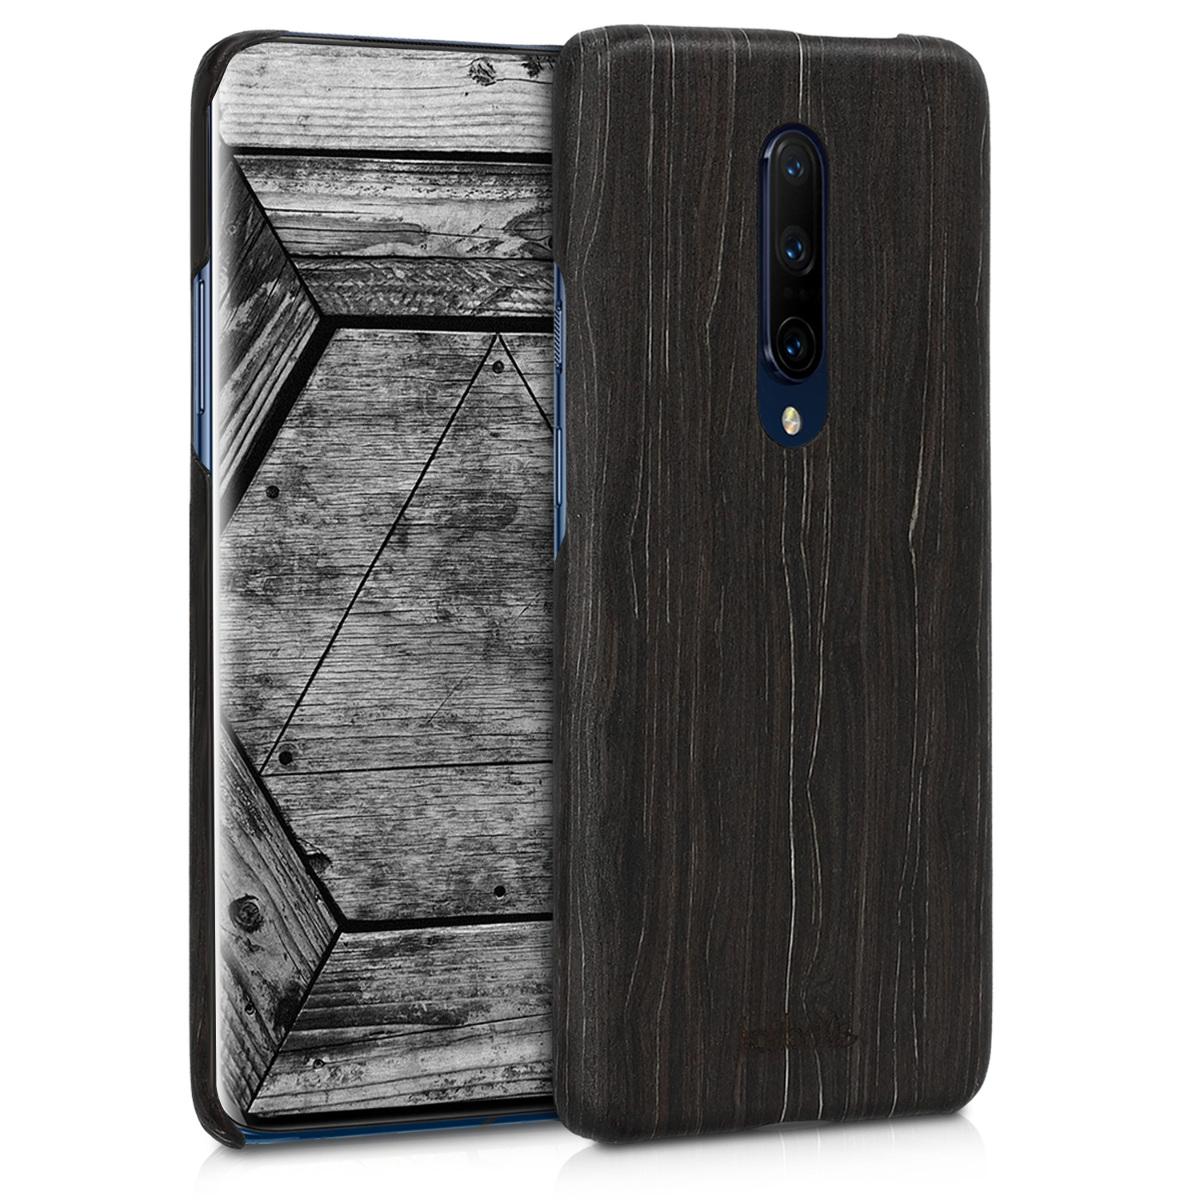 Kalibri Σκληρή Ξύλινη Θήκη OnePlus 7 Pro - Dark Brown (48597.01)